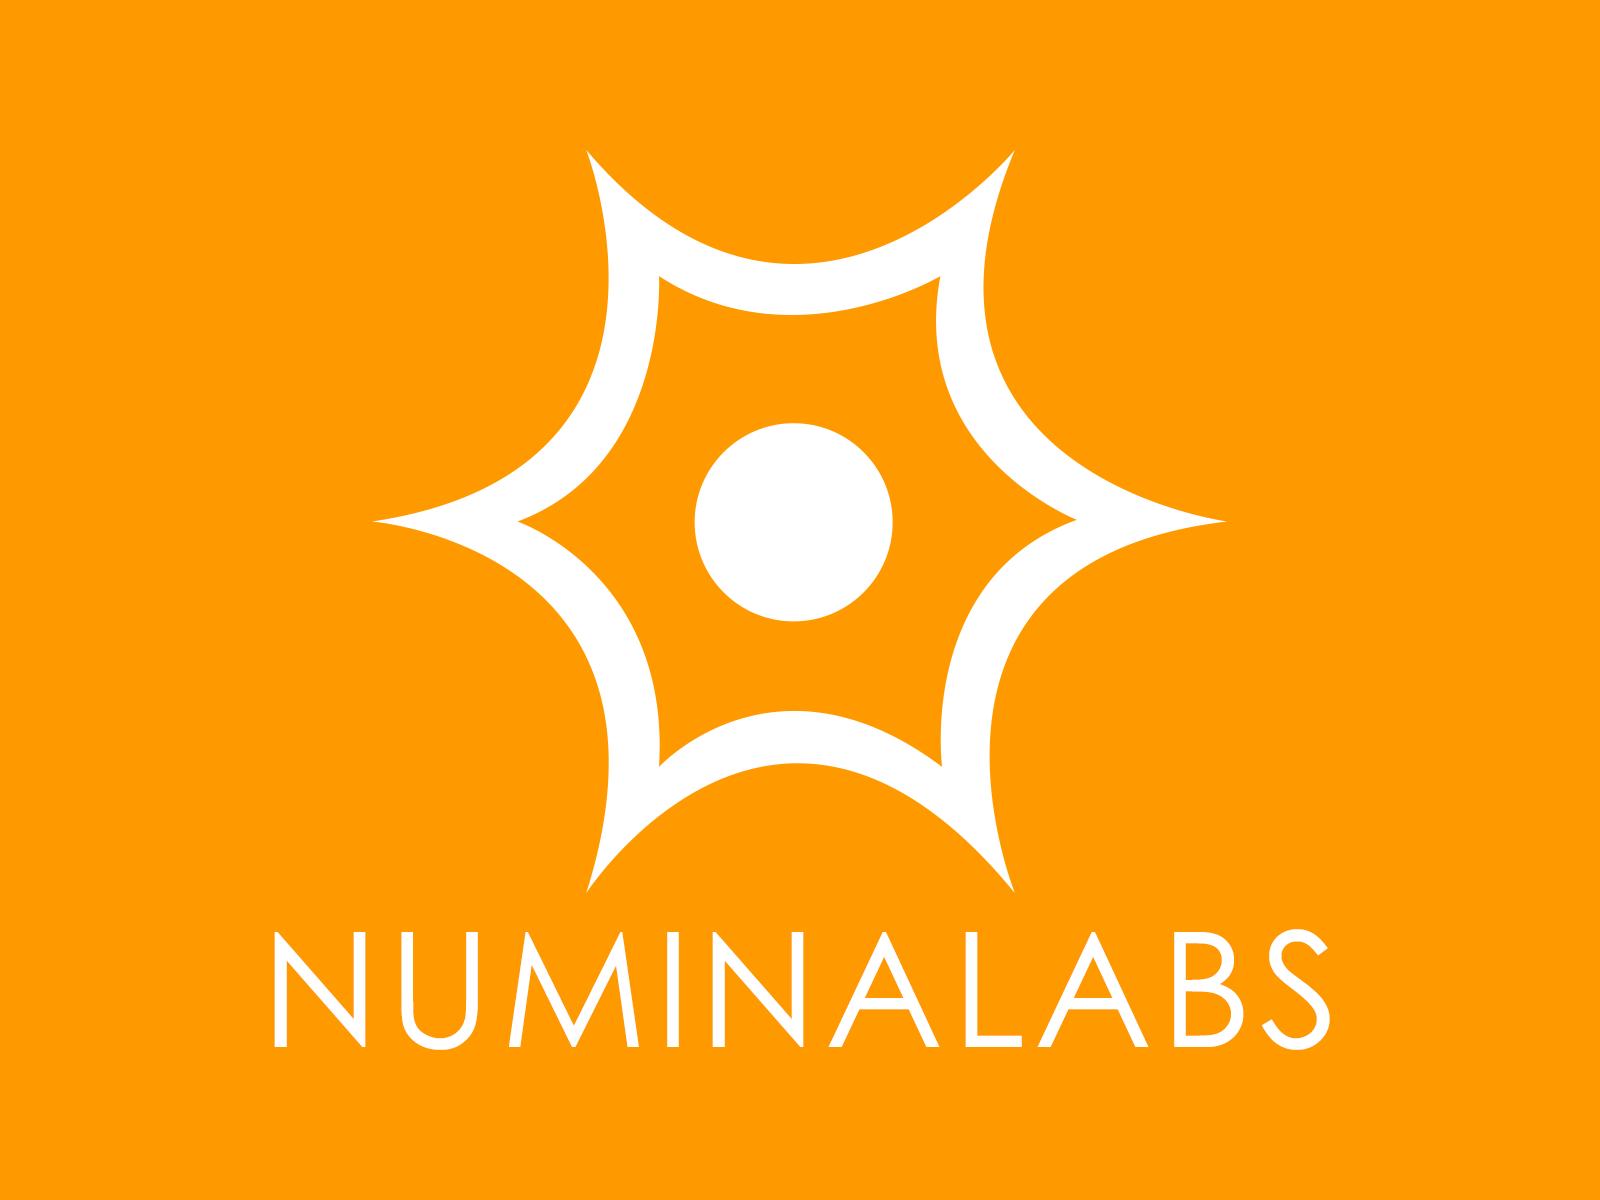 A empresa que gerencia o ScienceBlogs Brasil e outras iniciativas